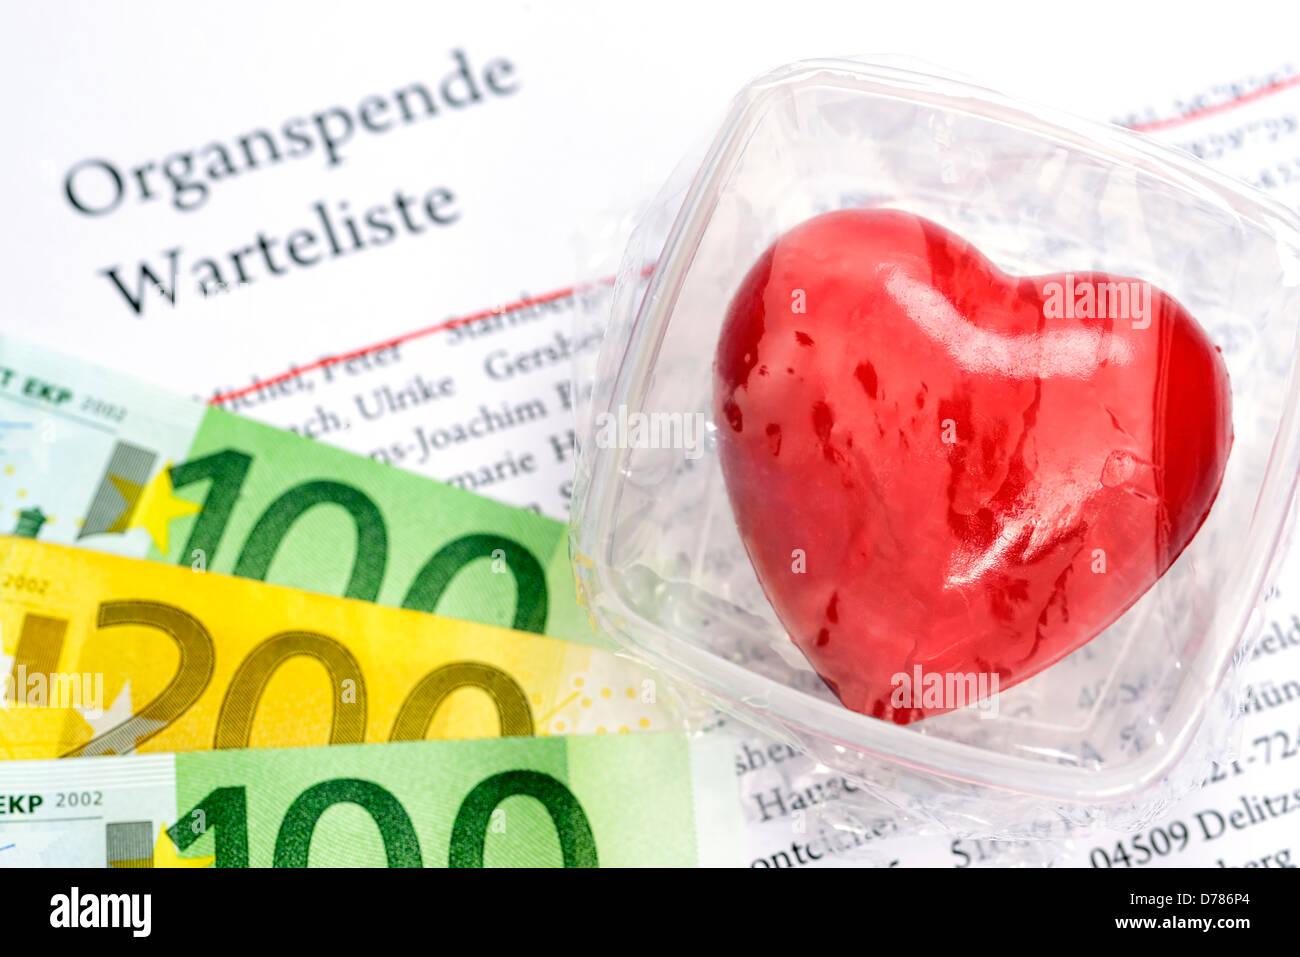 Heart in fresh hold box and organ donation vantage point list, symbolic photo organ donation - Stock Image